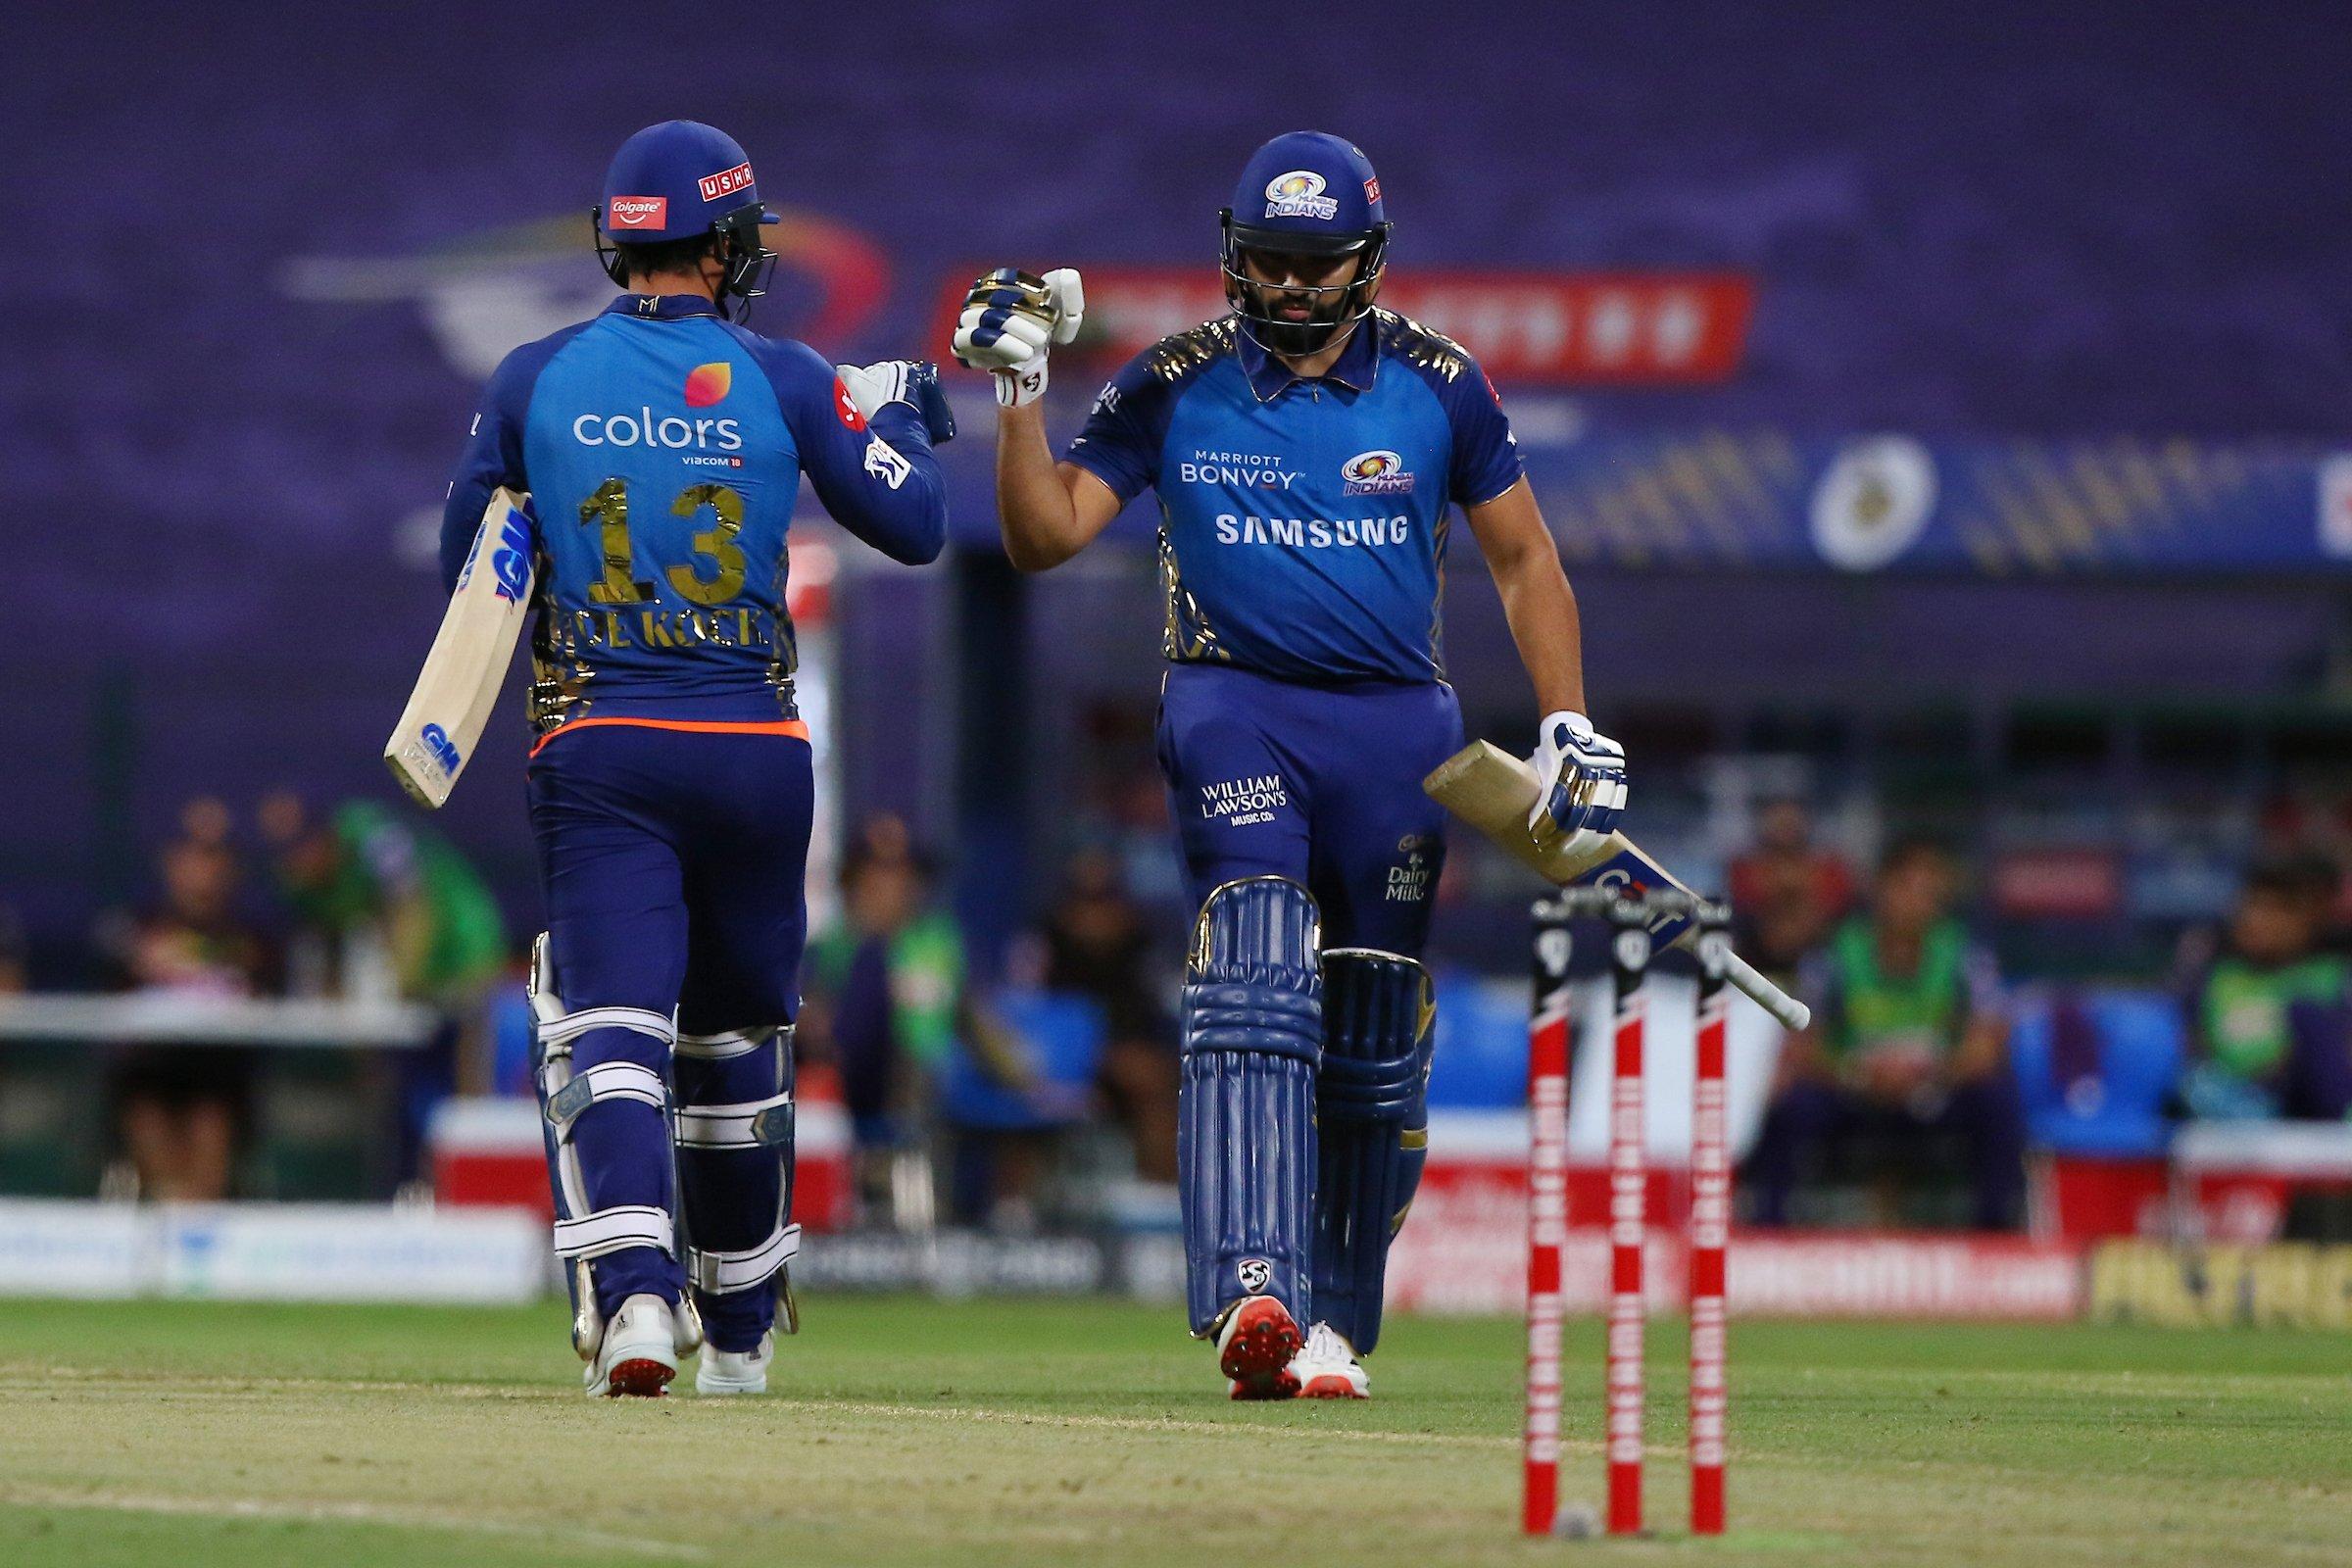 IPL 2020, MI vs KKR Highlights: Mumbai Indians beat Kolkata Knight Riders by 8 wickets